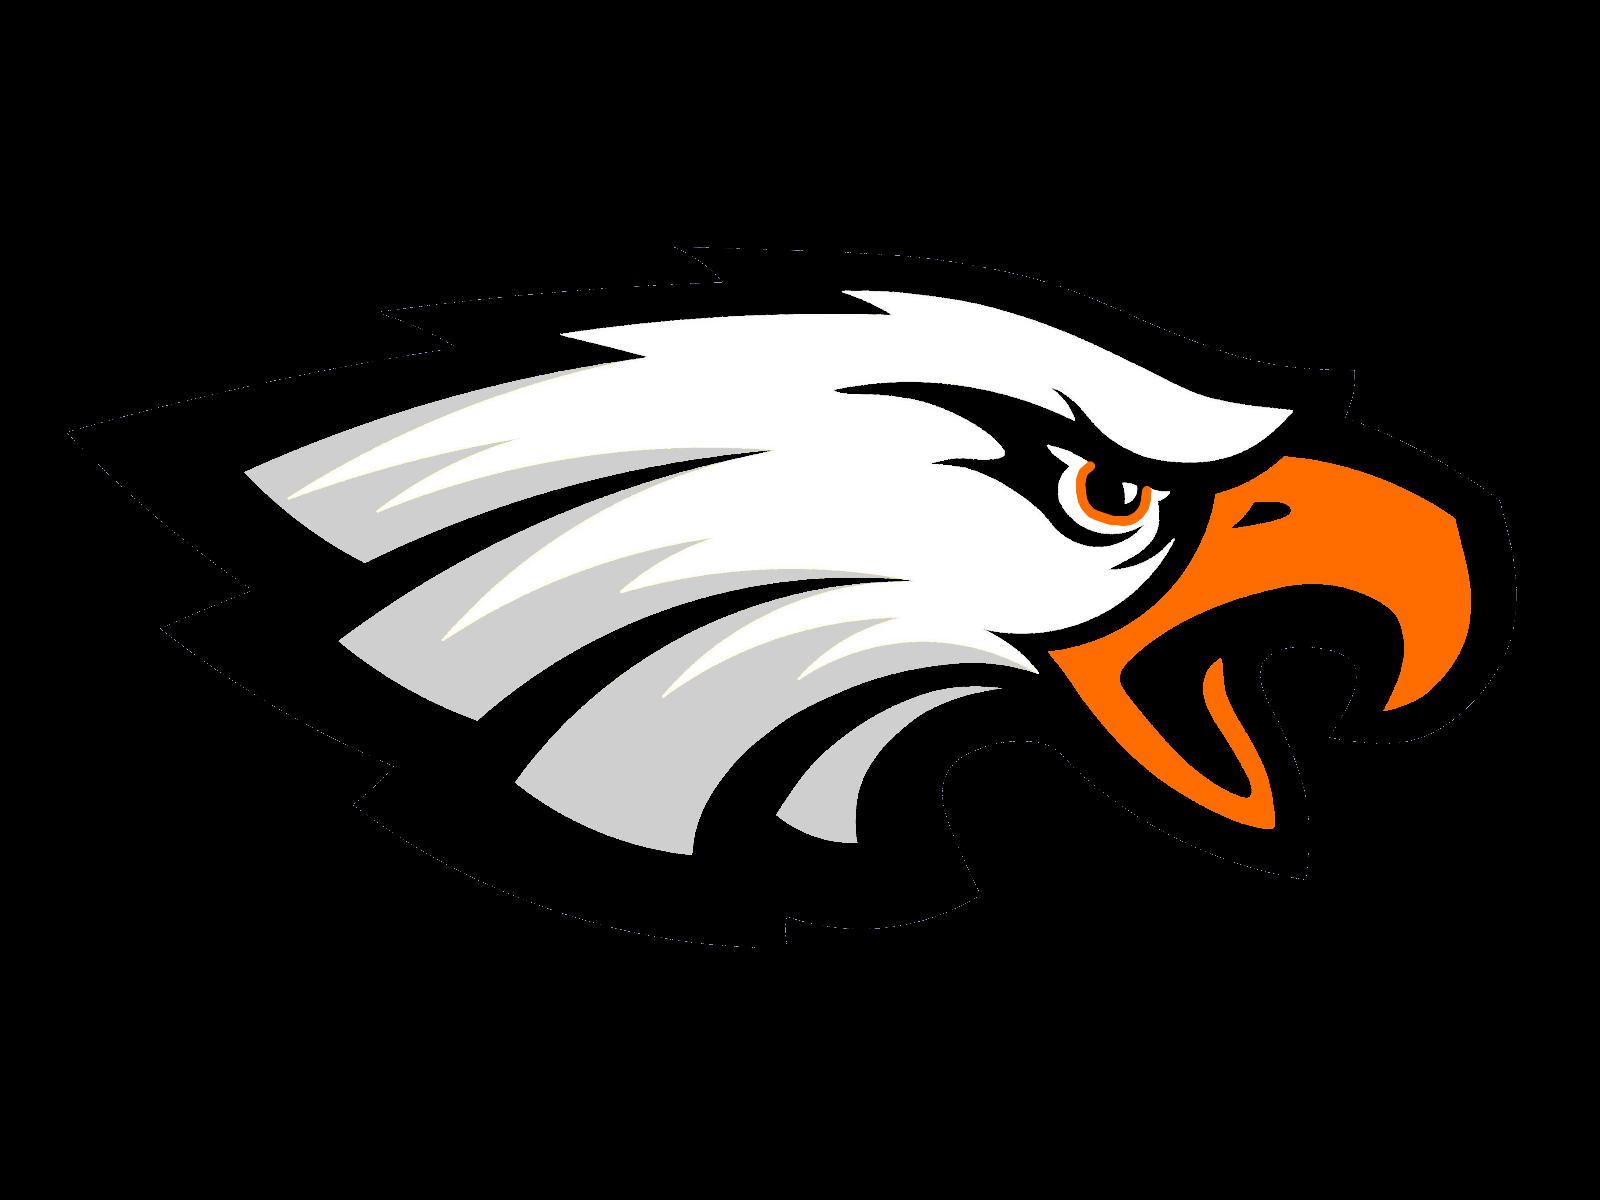 Eagles clipart eagle profile. The south charleston black